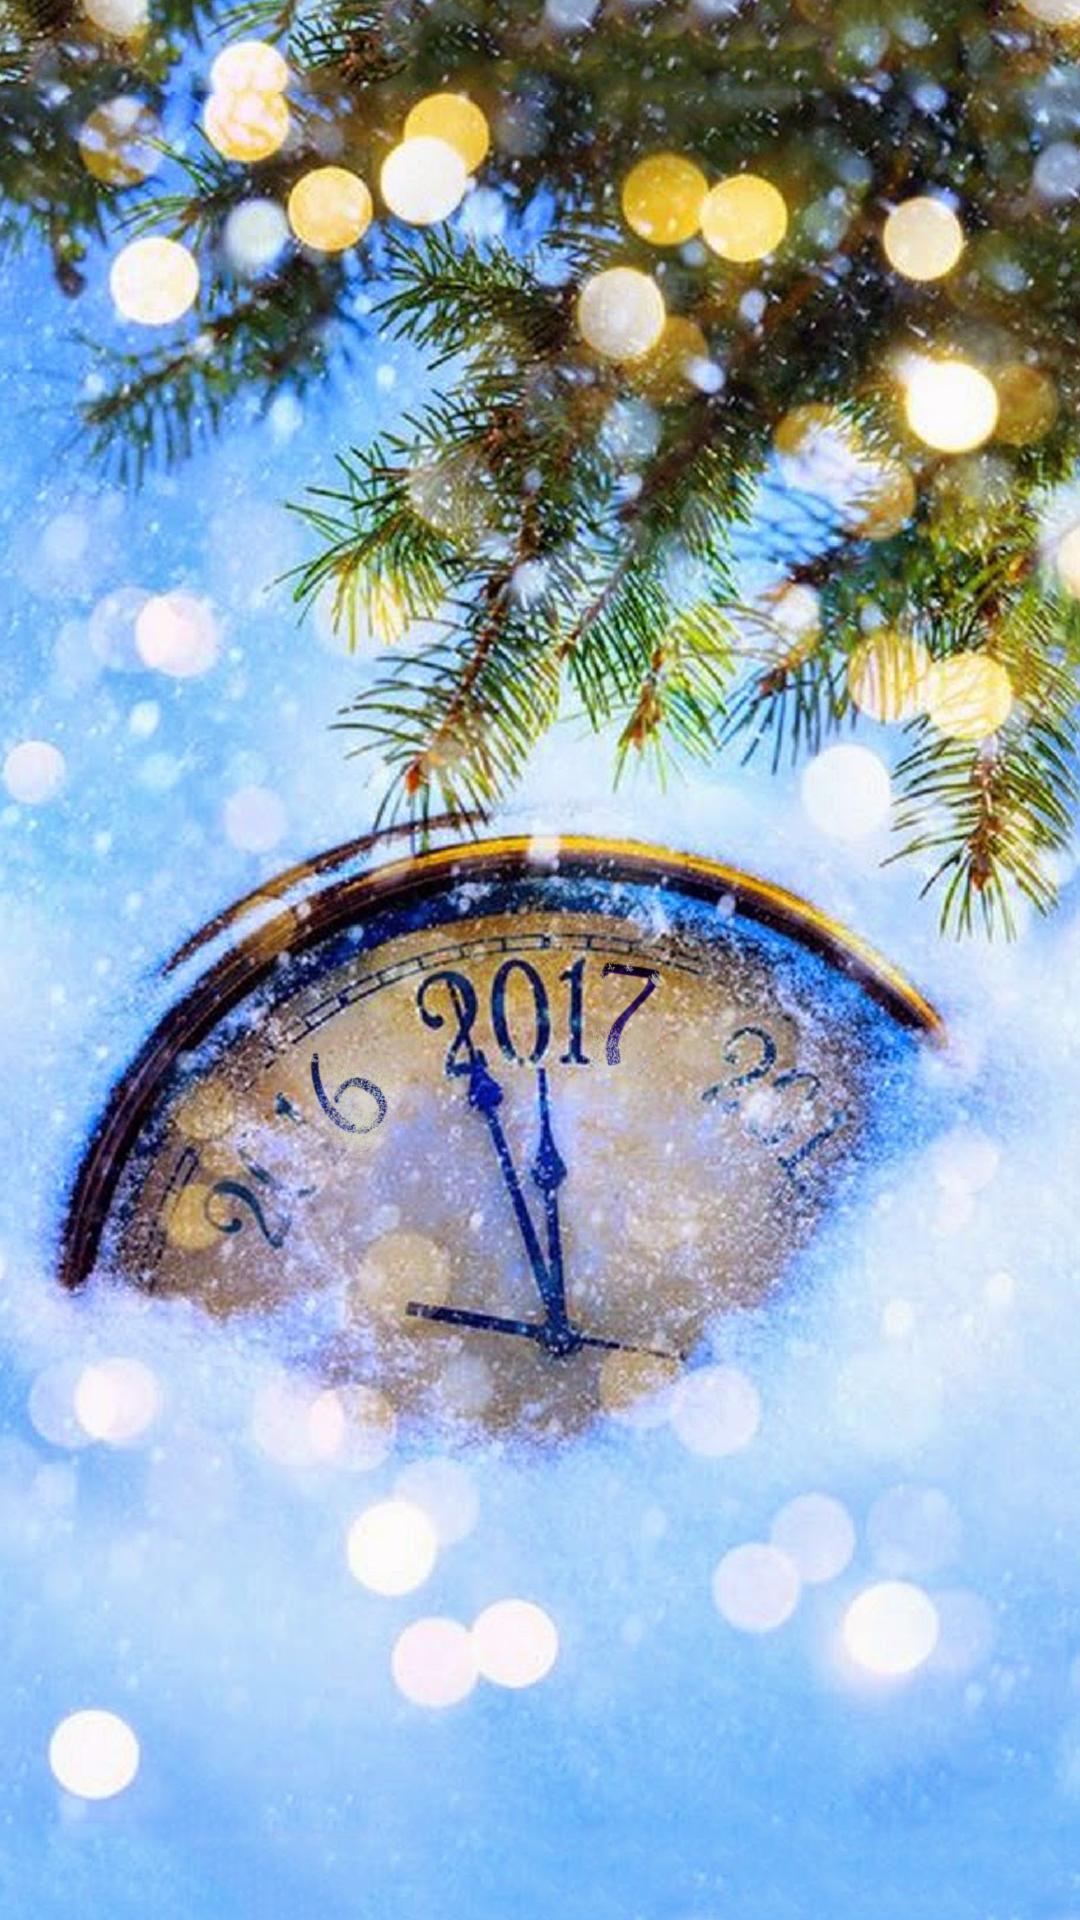 New Year Wallpaper Phone 2017 Holidays Christmas IPhone